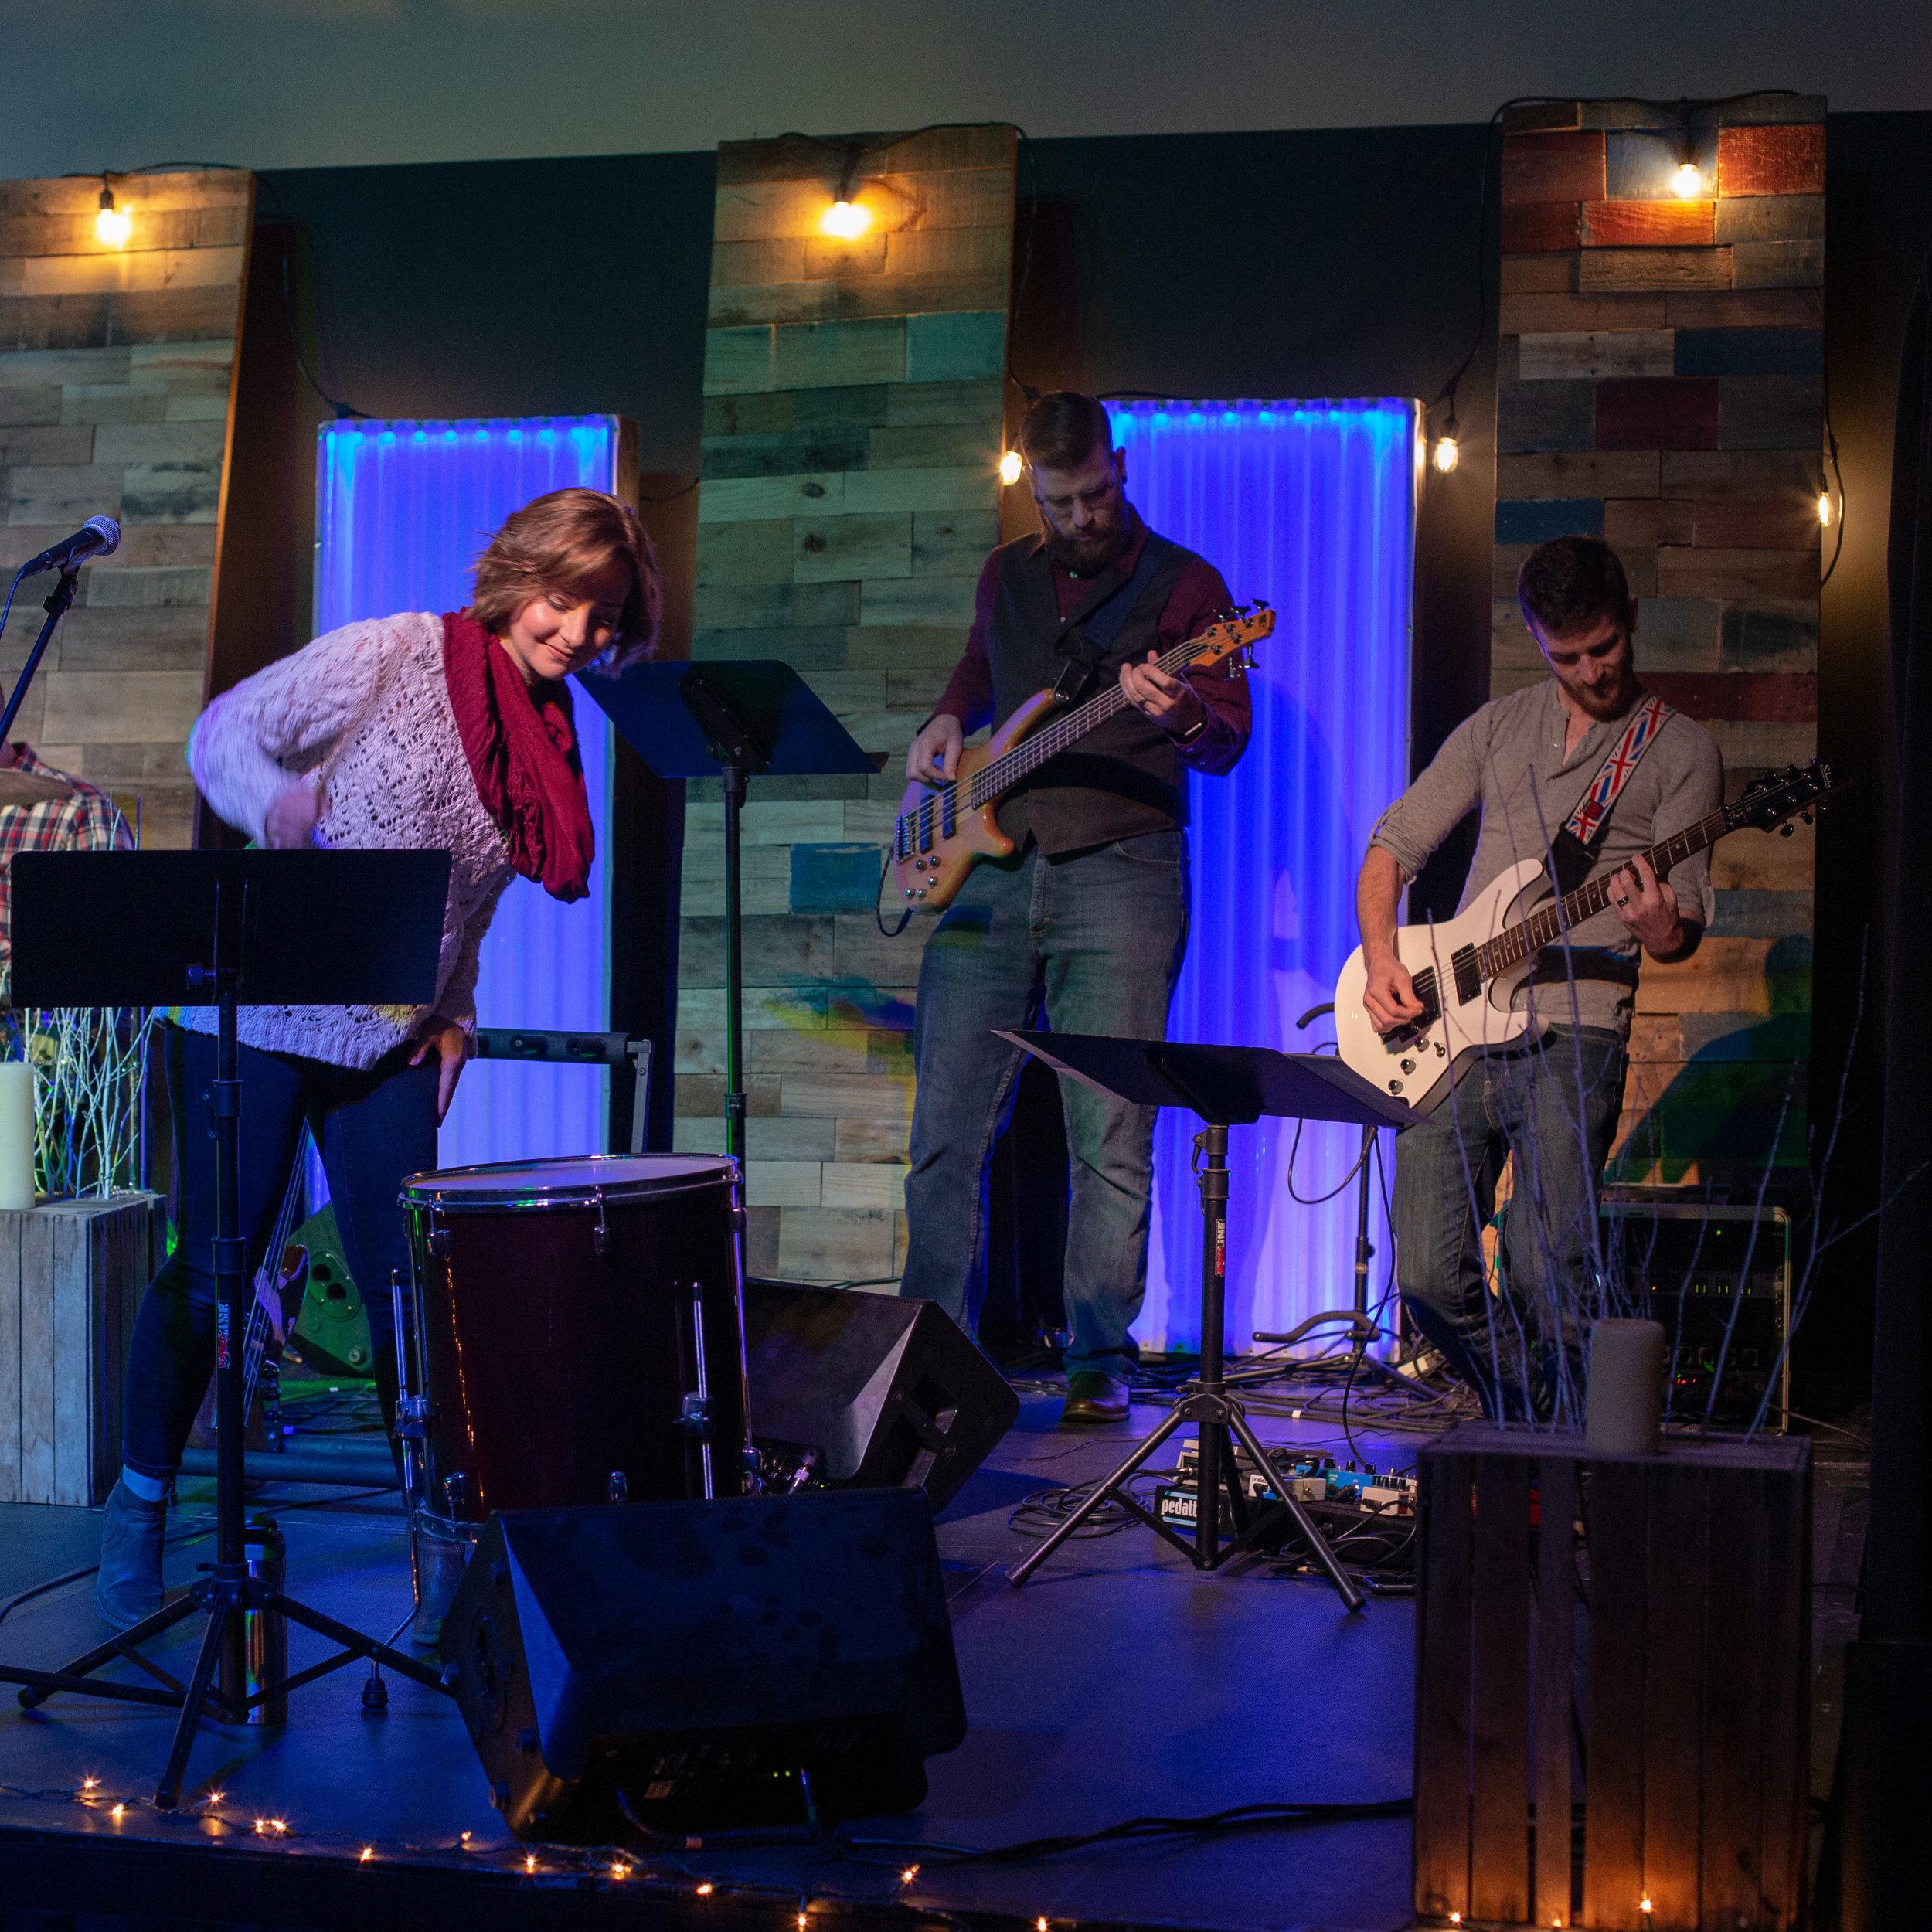 The Band: Bassist - Volunteer